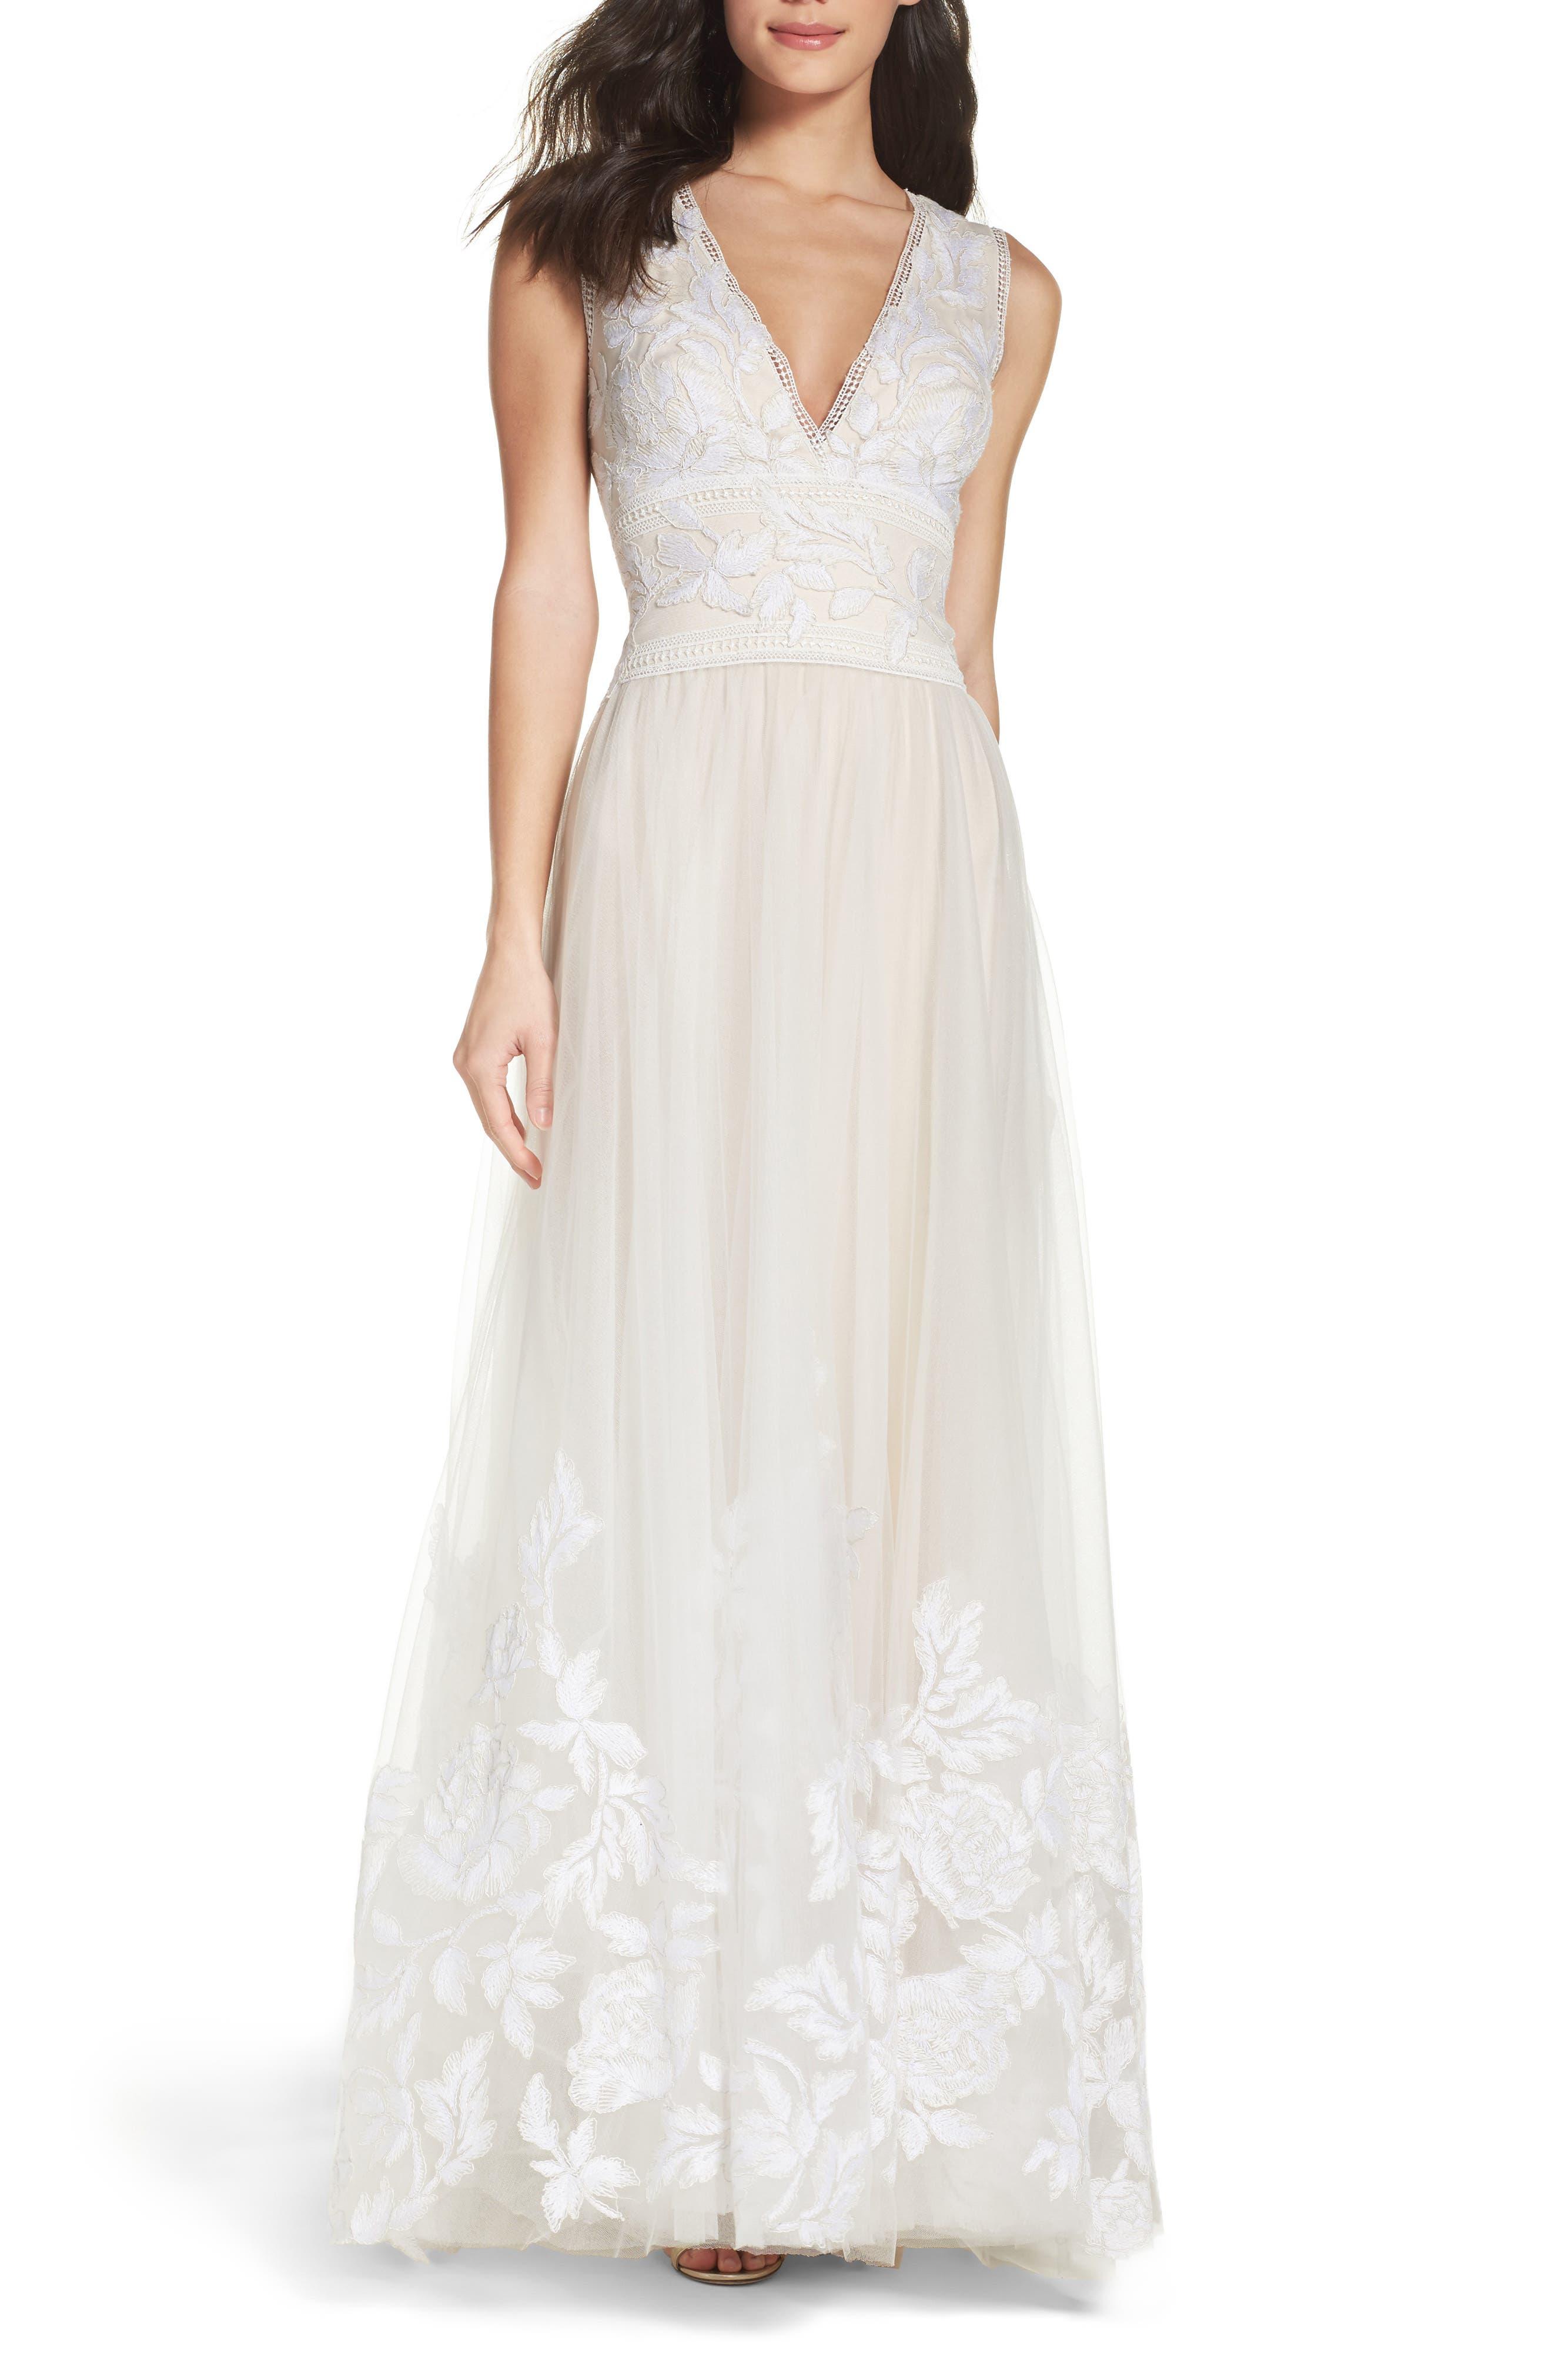 Tulle Lace A-Line Gown,                             Main thumbnail 1, color,                             IVORY/ PETAL